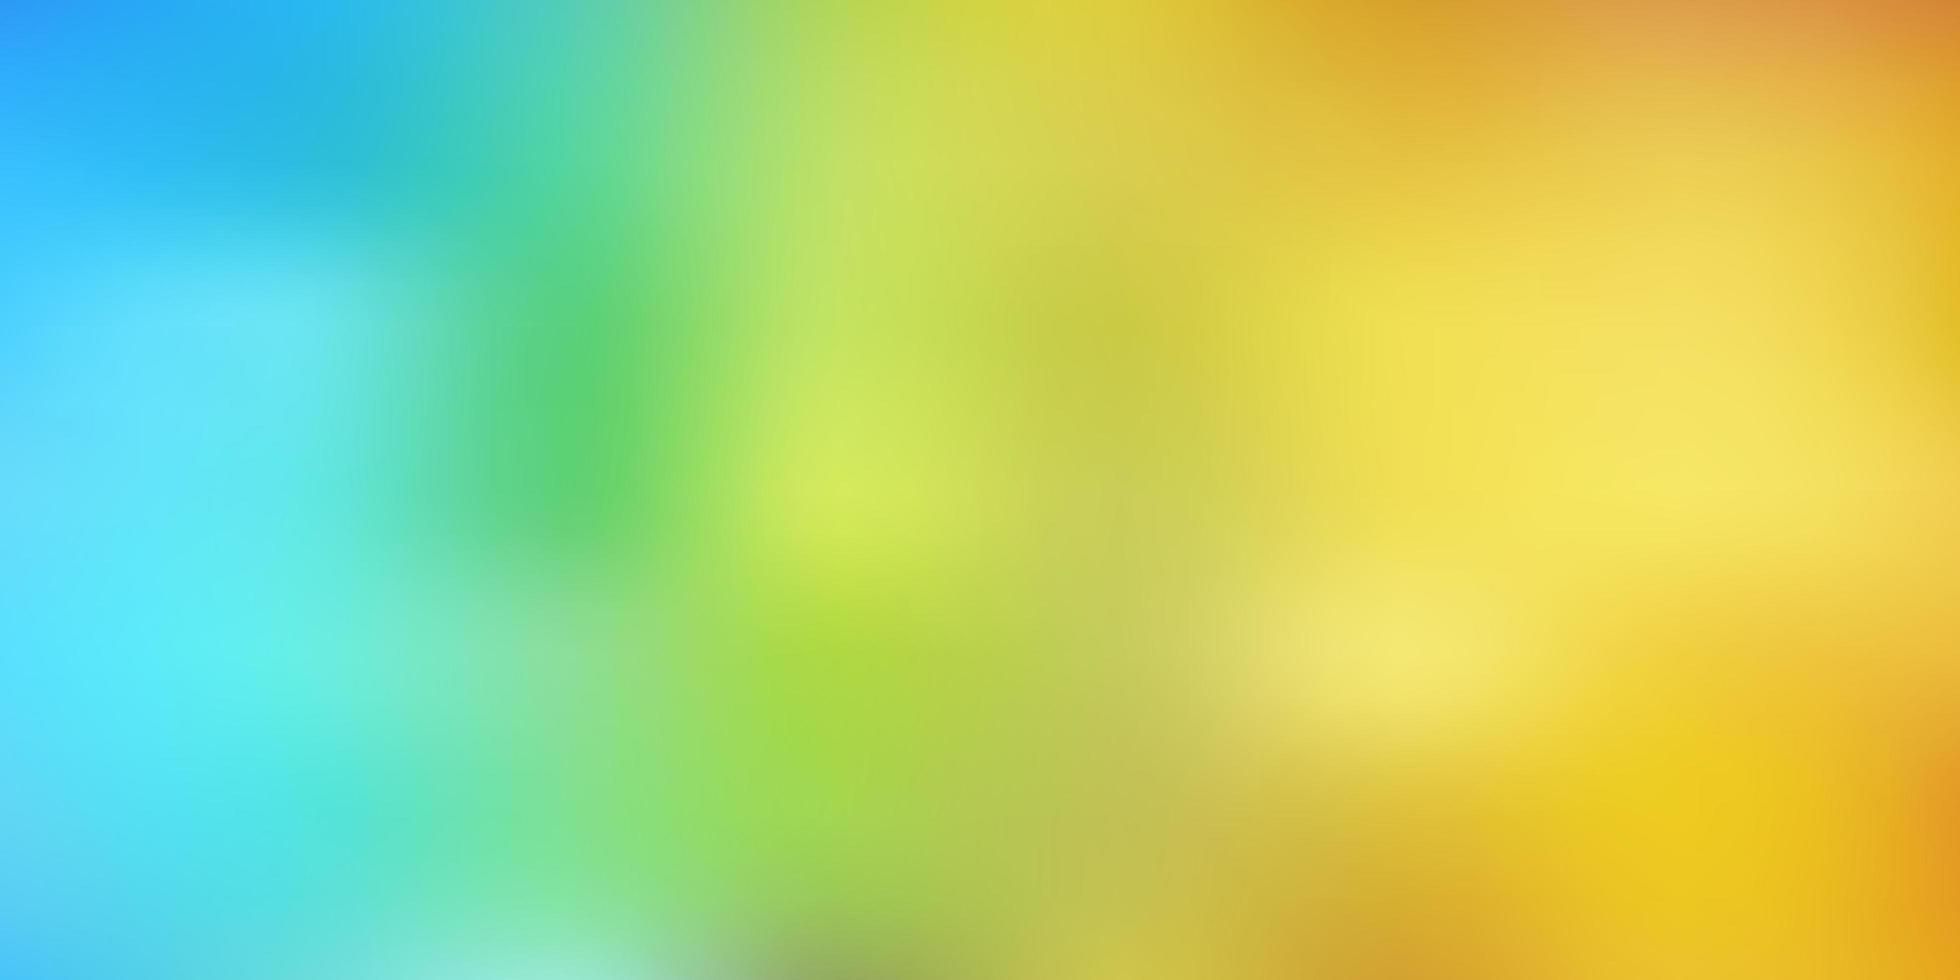 layout desfocado azul claro, amarelo. vetor